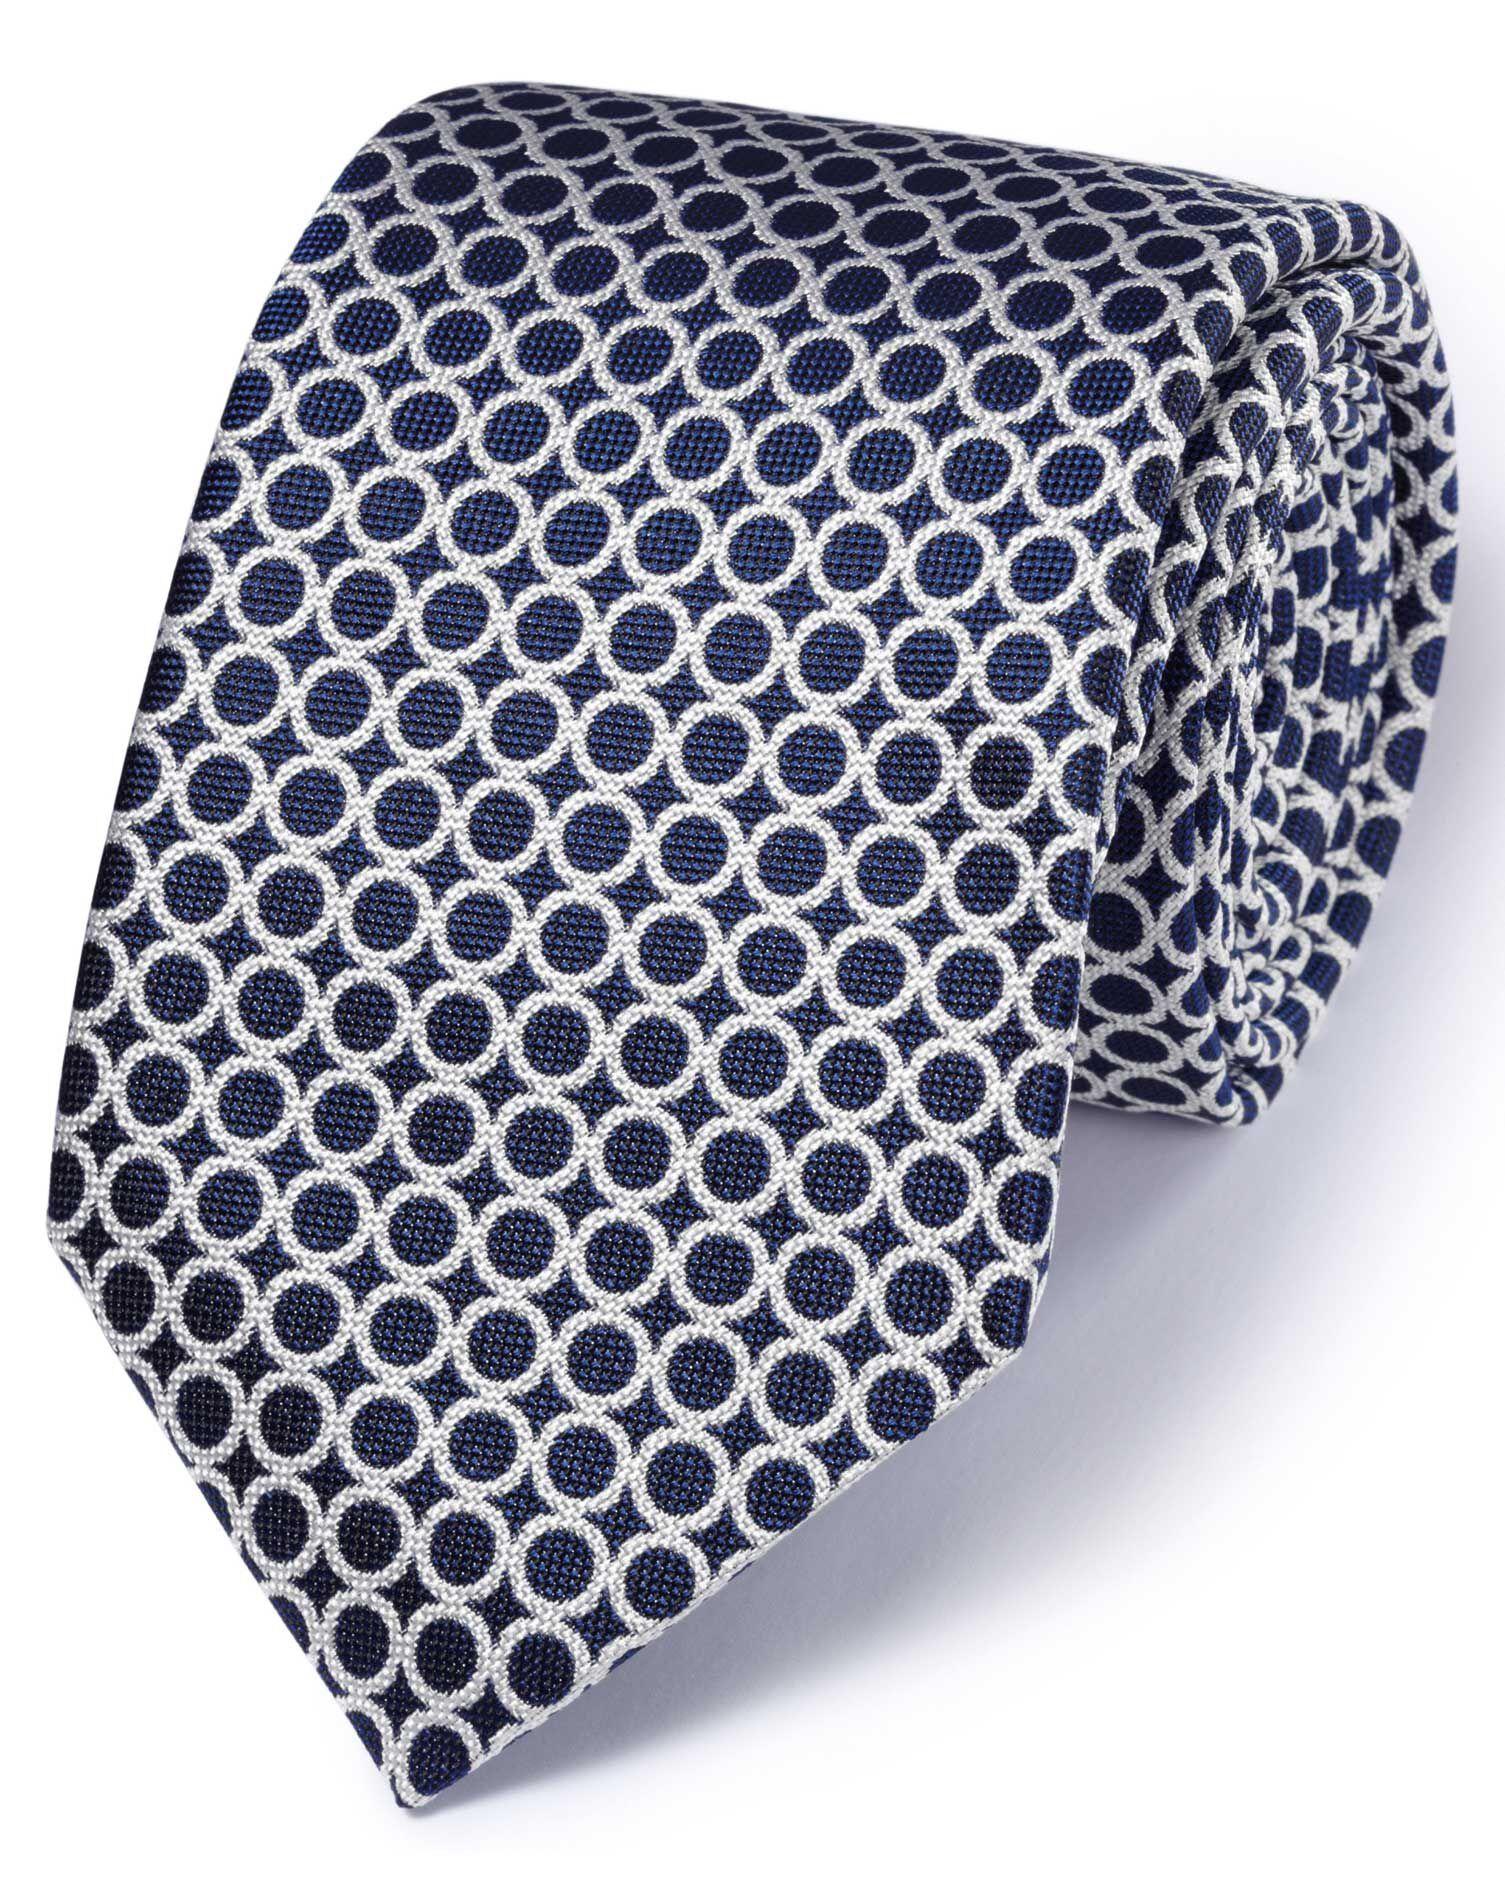 Navy & White Silk English Luxury End-On-End Tie Size OSFA by Charles Tyrwhitt